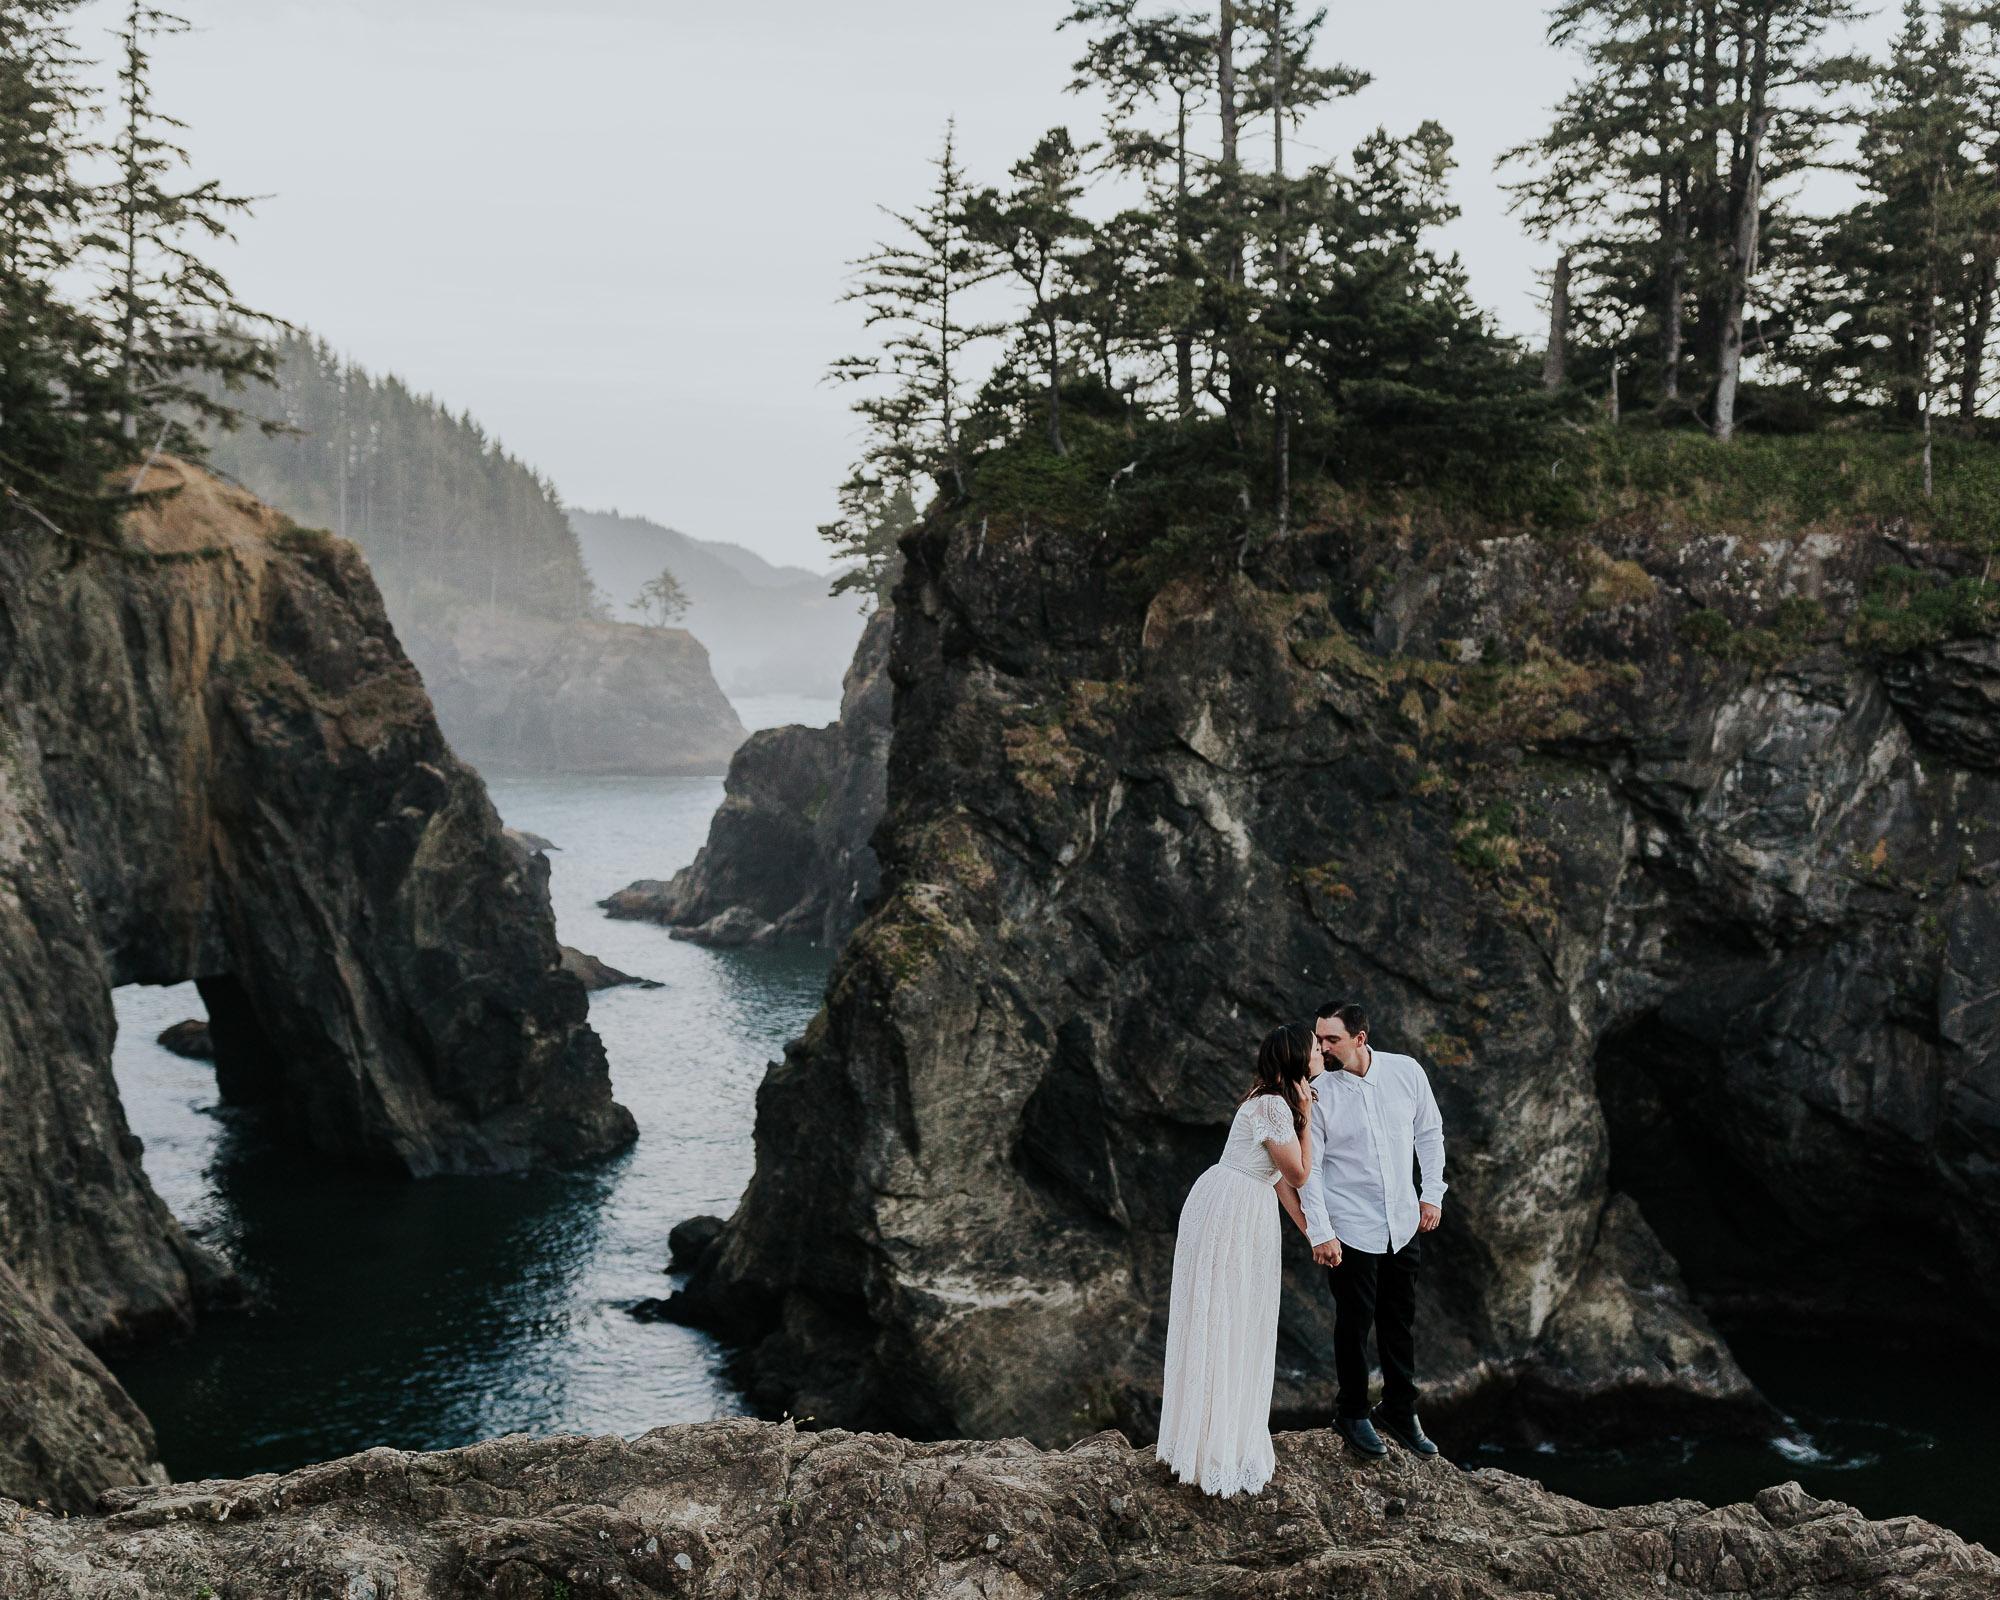 oregon adventure elopement photographer oregon coast wedding emily hary